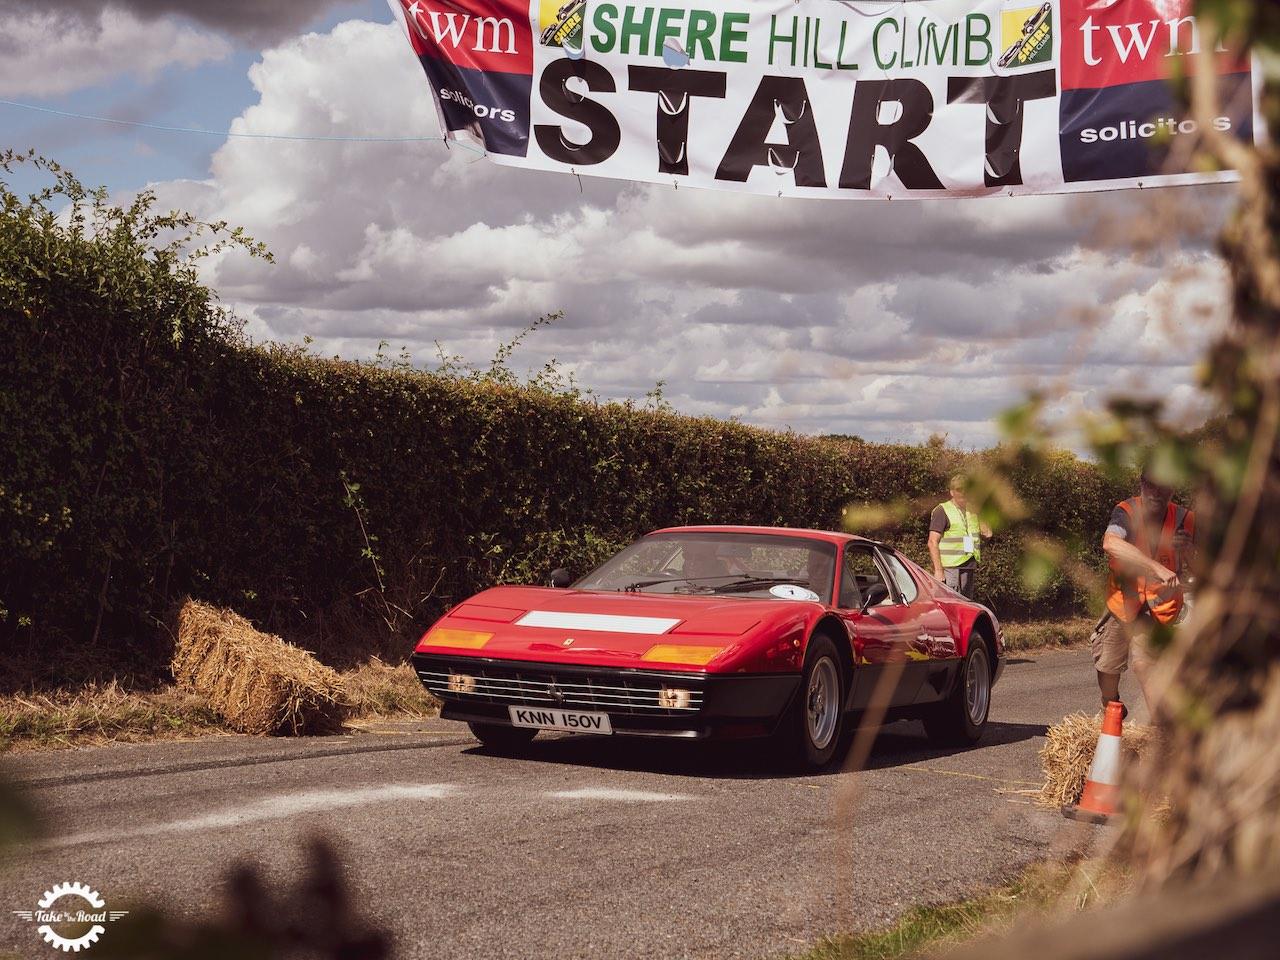 Shere Hill Climb set to return this September